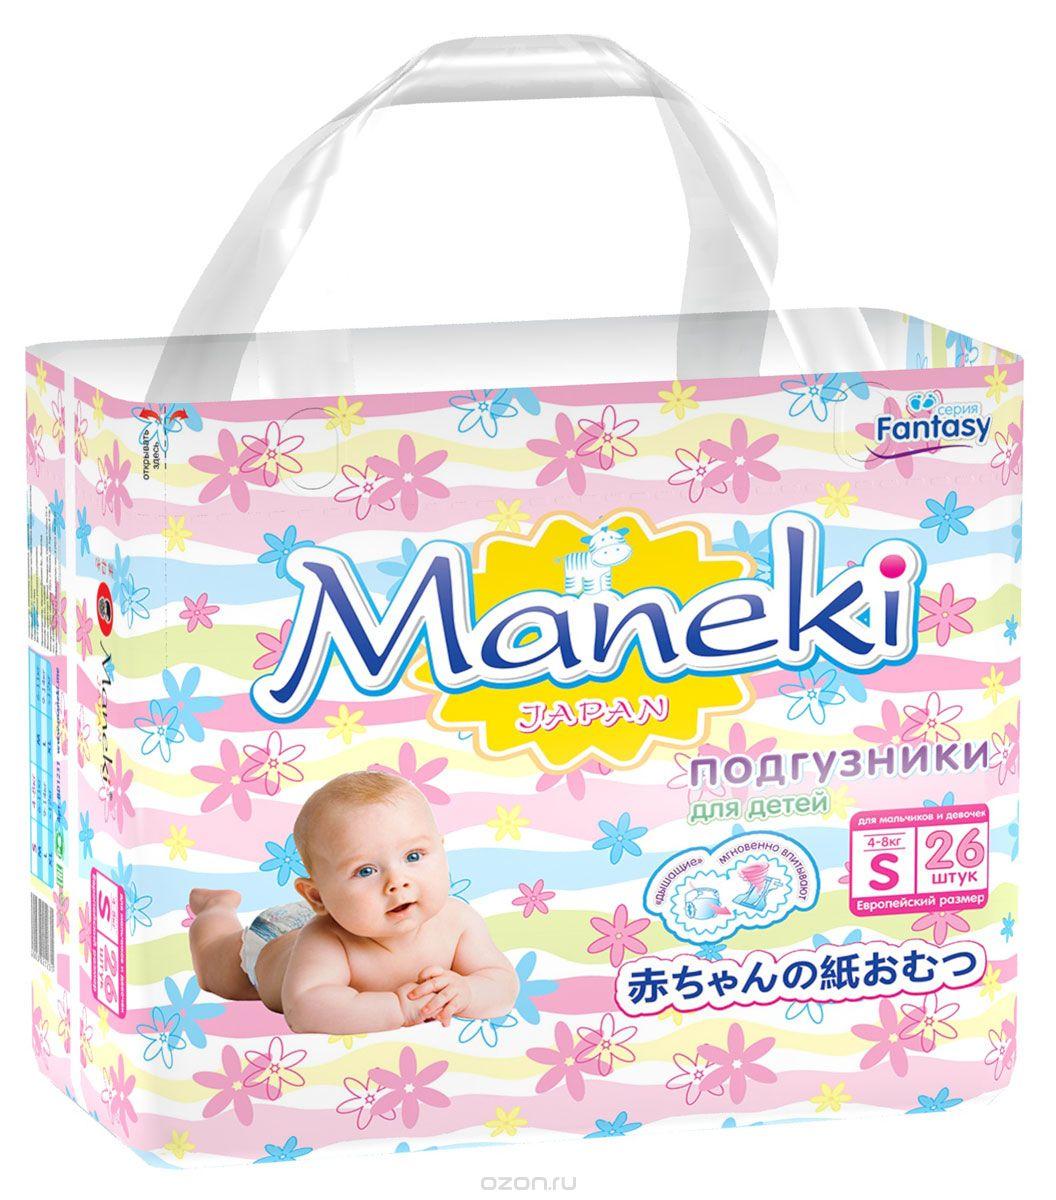 Подгузники Maneki Fantasy, размер S (4-8 кг) mini 26 шт/уп